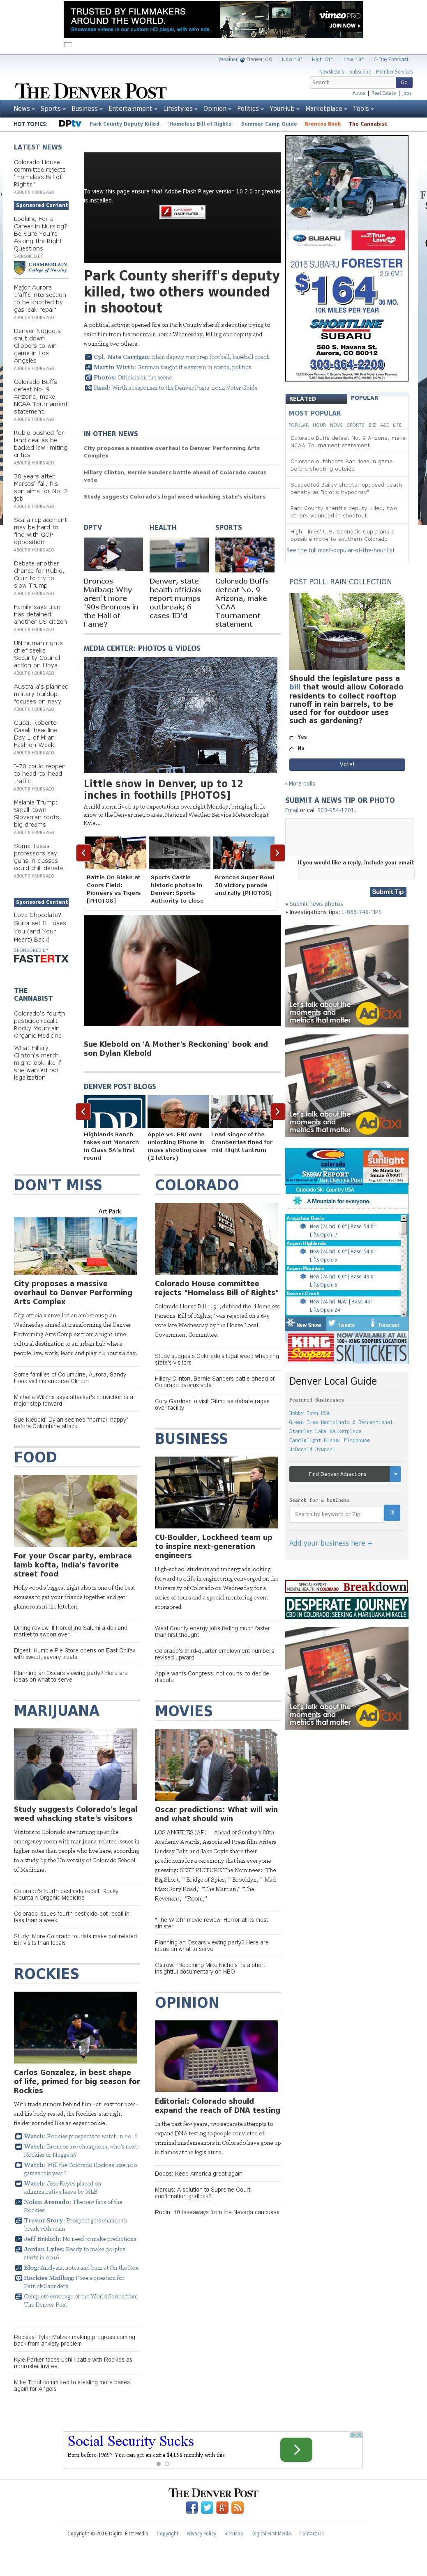 Denver Post at Thursday Feb. 25, 2016, 9:03 a.m. UTC